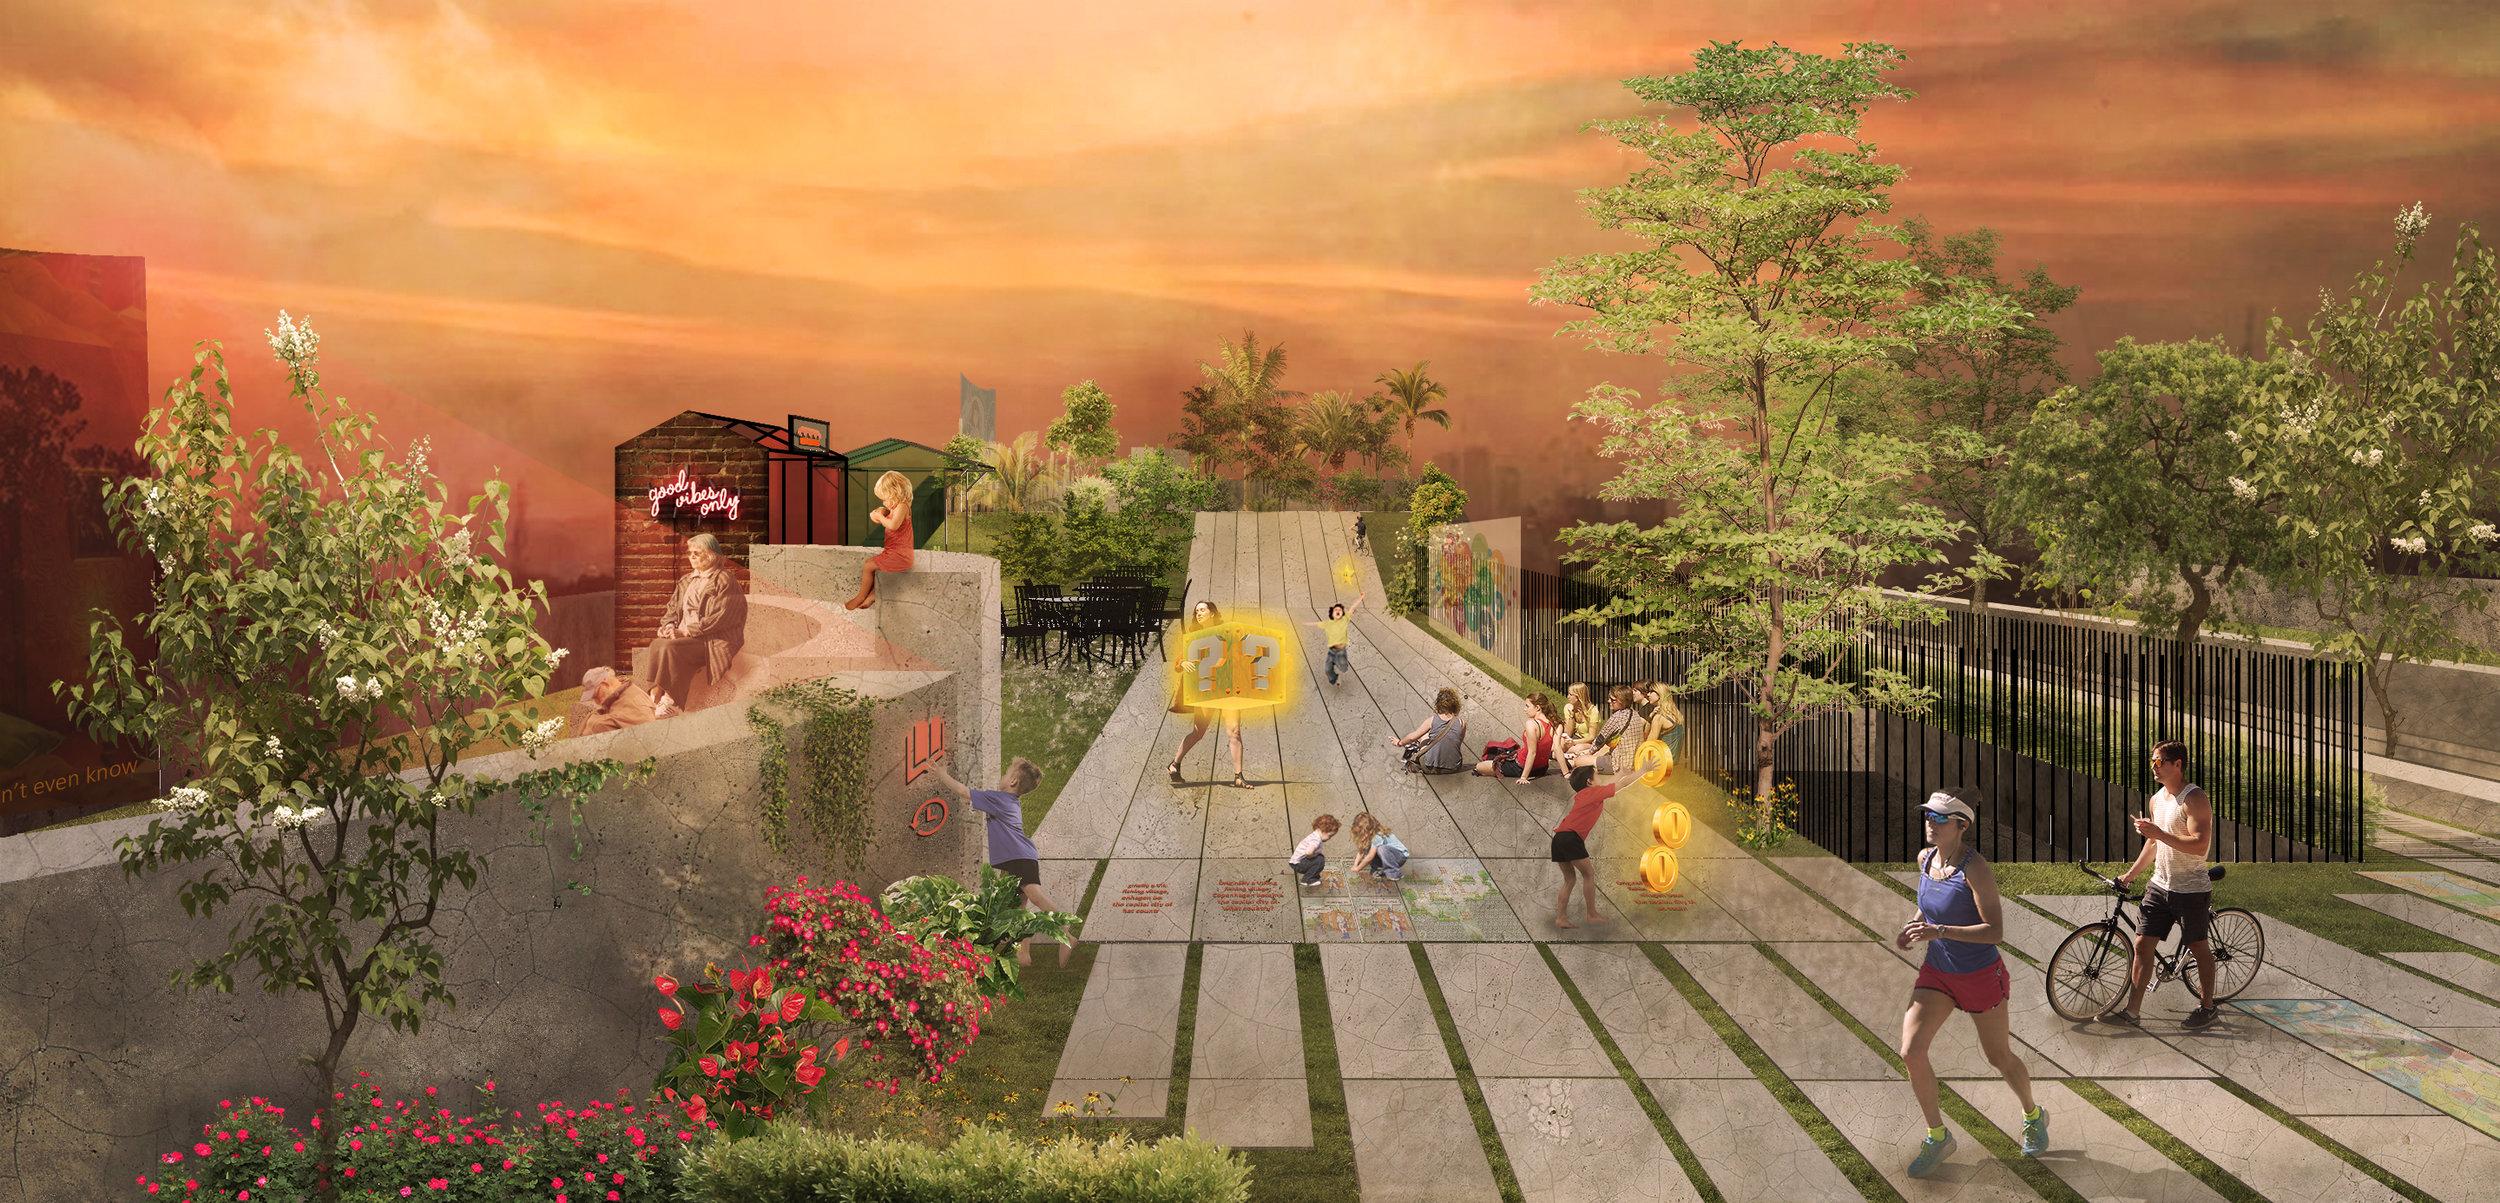 Atelier Aitken Urban Library Park Rooftop Cinema and gardens.jpg